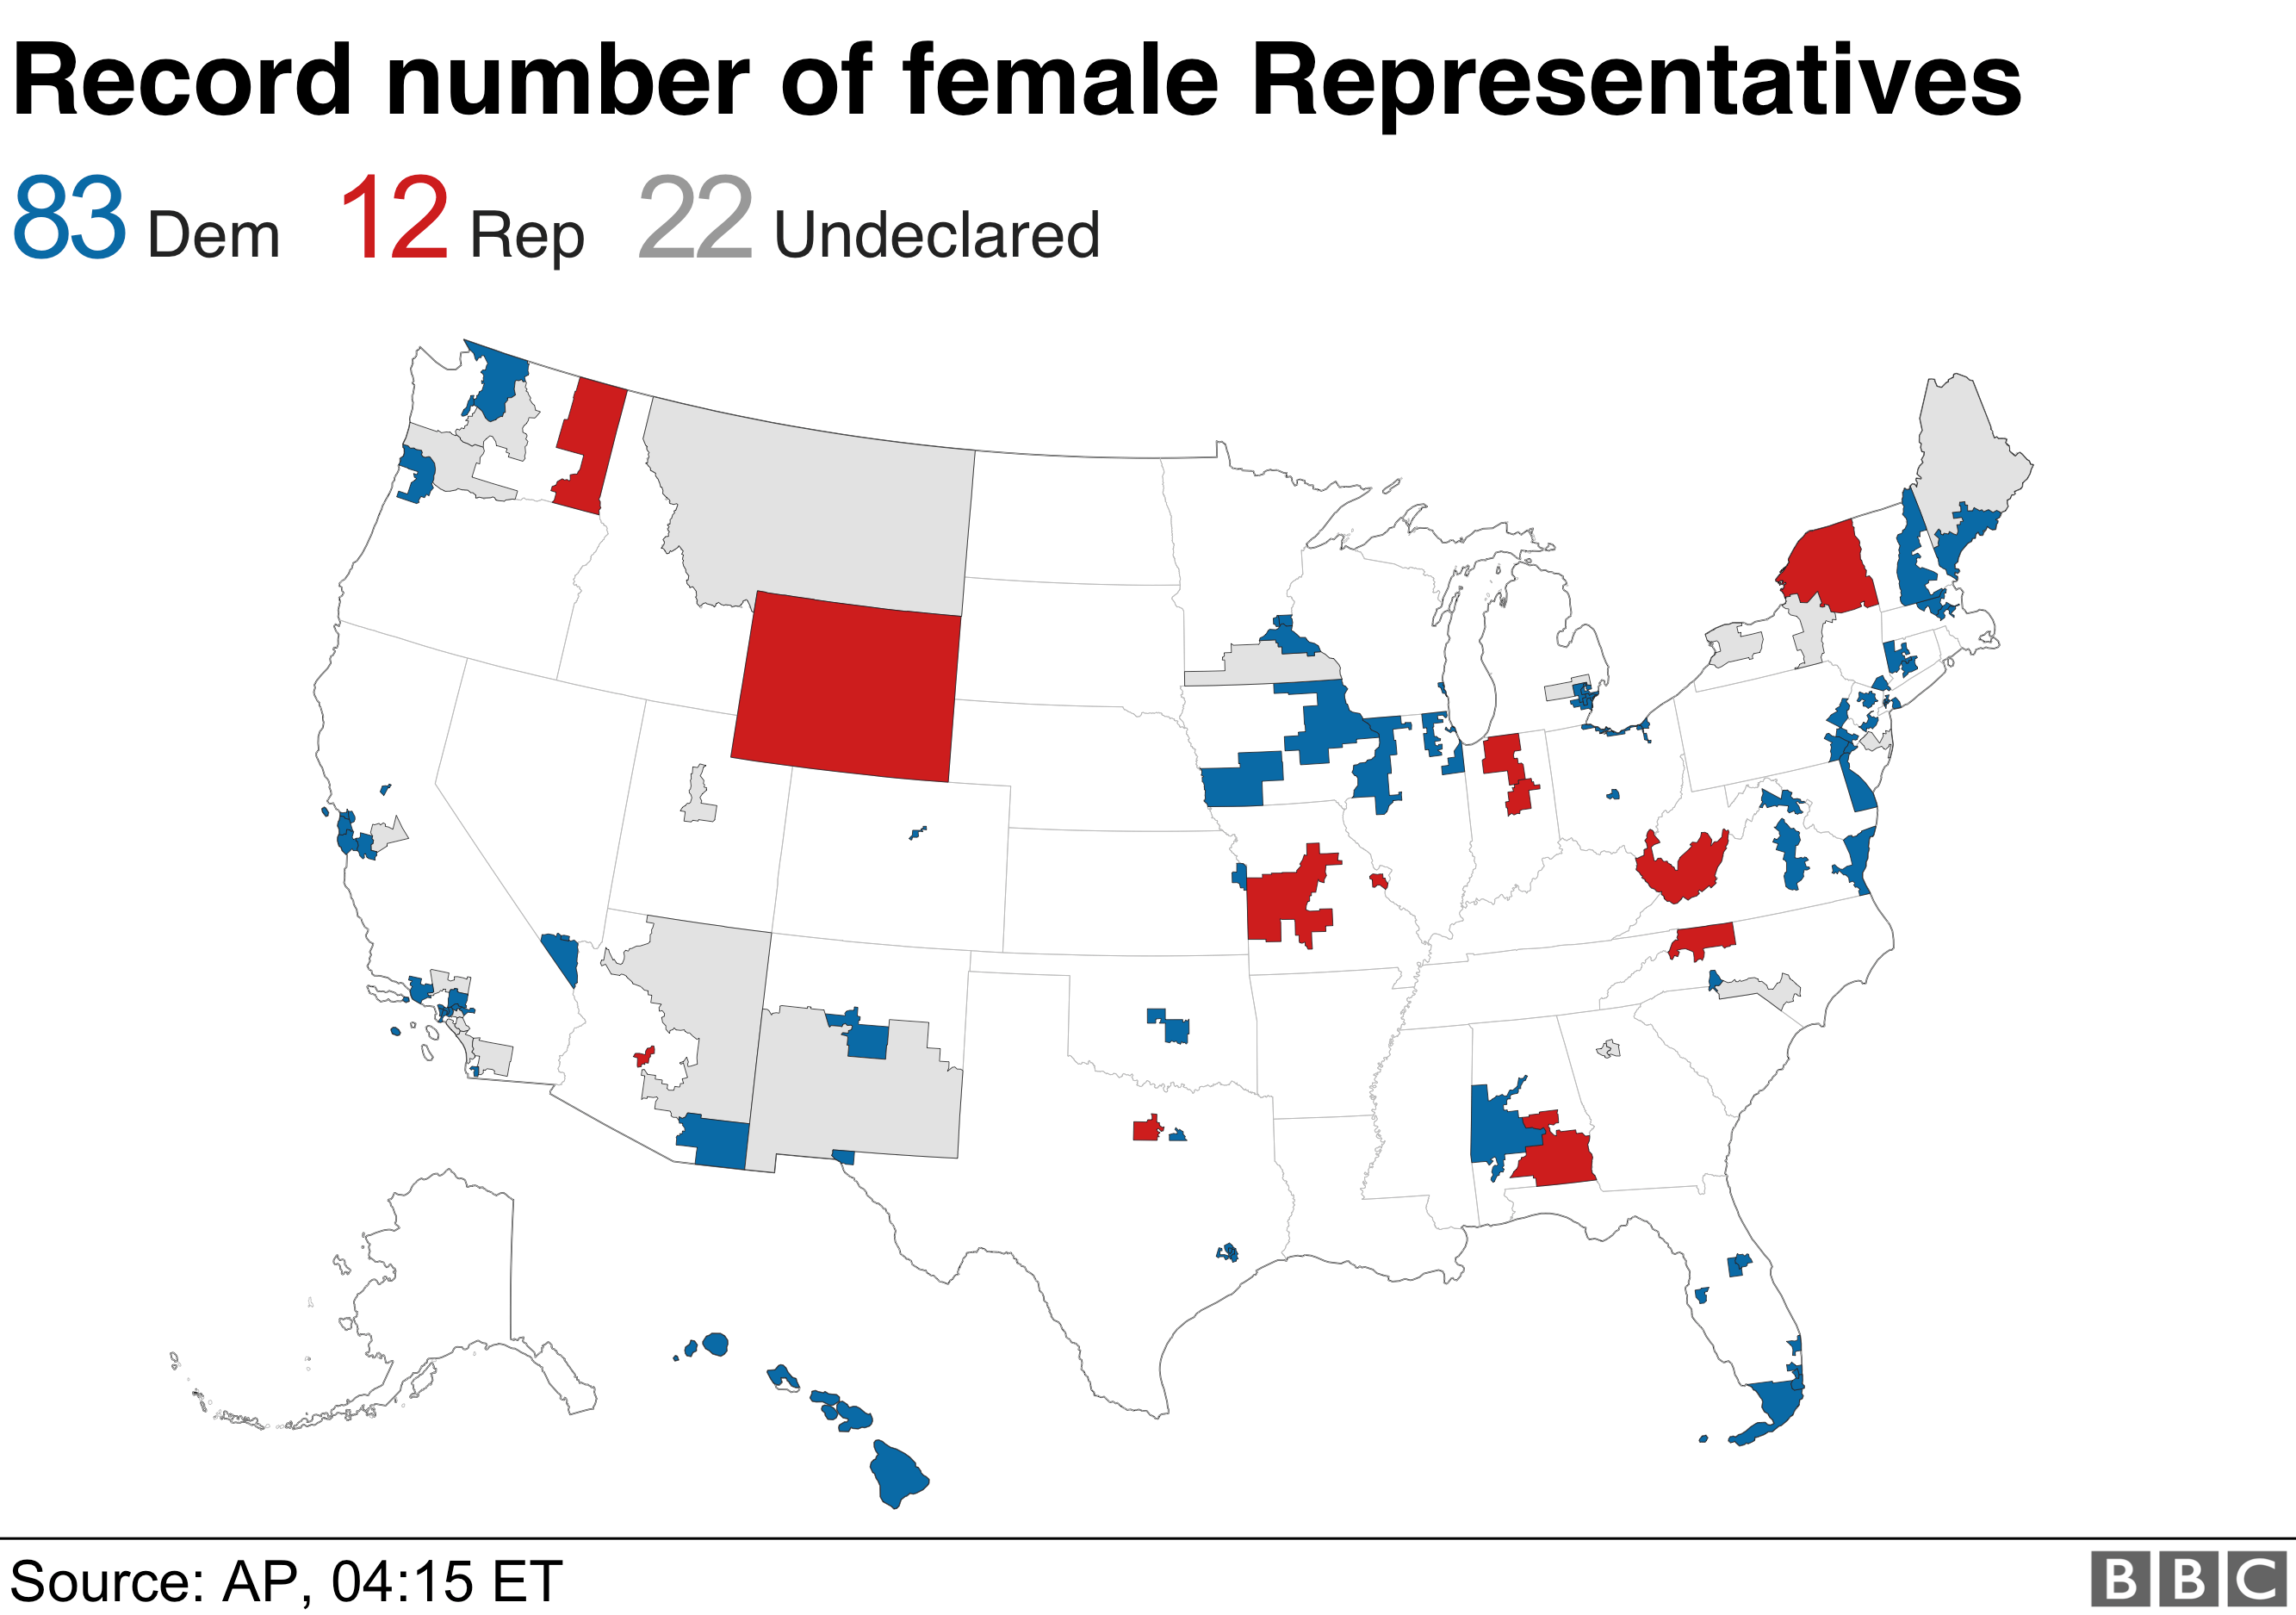 Female representation in the House of Representatives